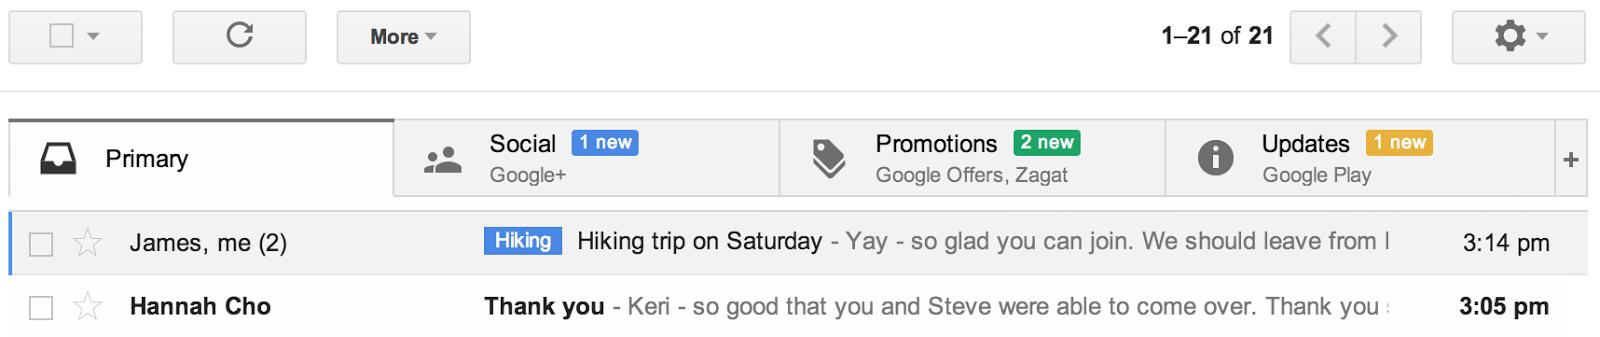 Google announces a 'New Inbox'